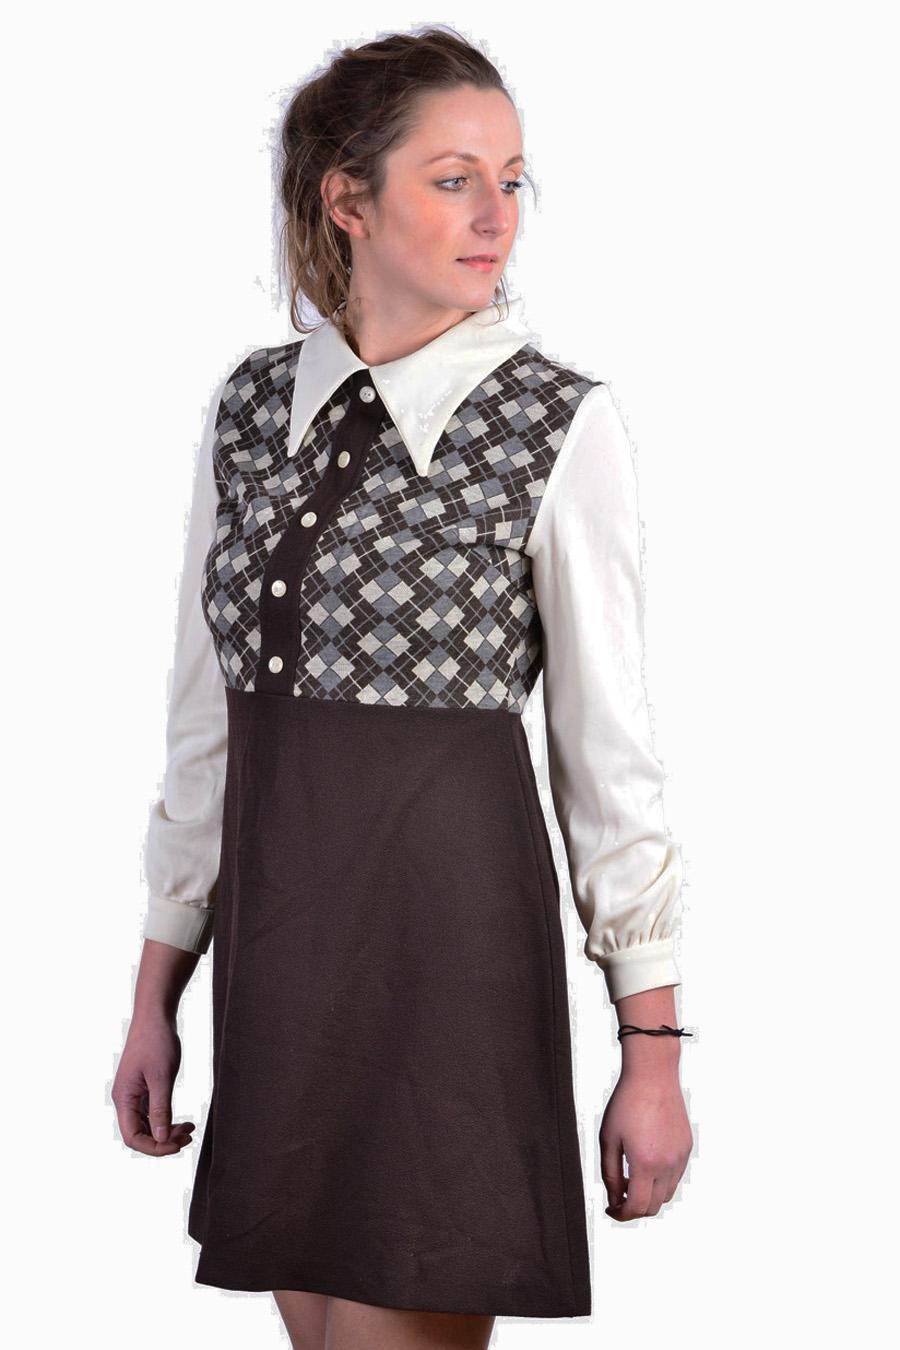 Vintage Miss Devonshire mini dress